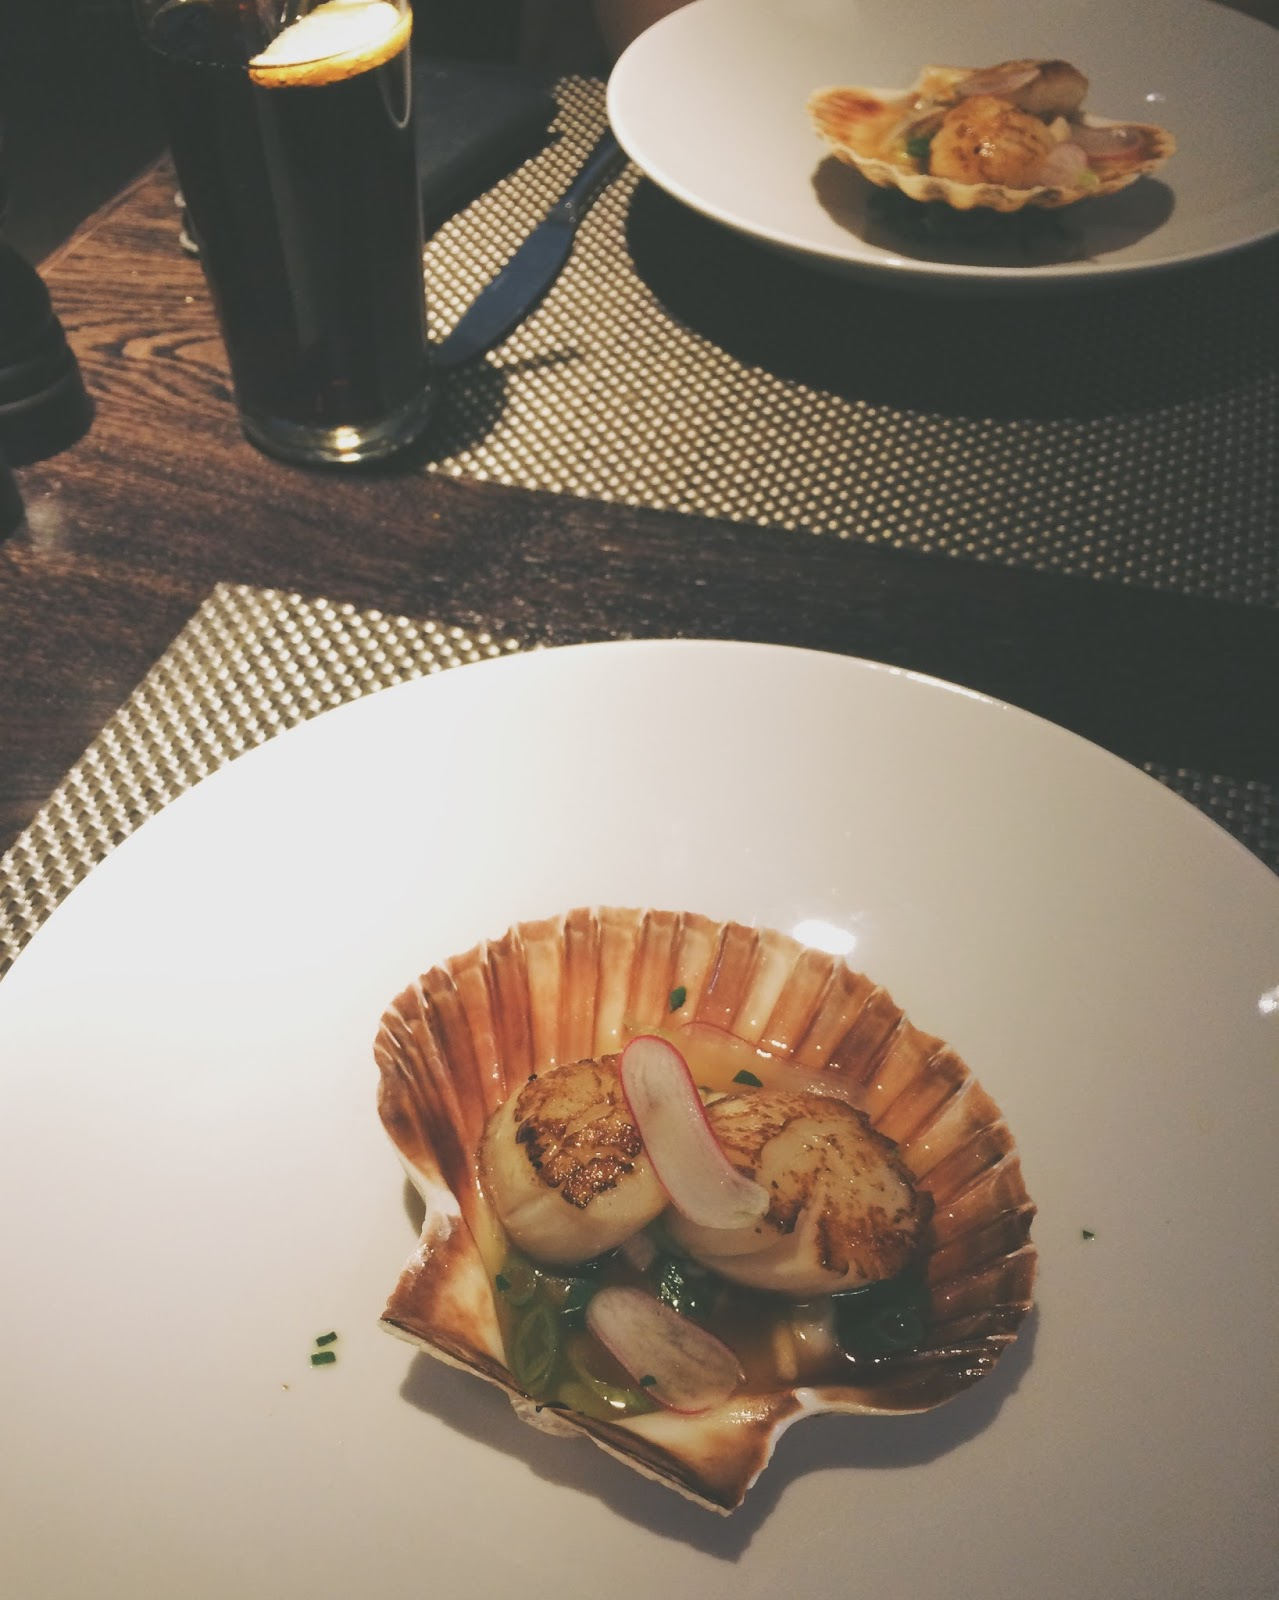 appetizer, glasgow food, scallop starter, where to eat in glasgow, dakota deluxe restaurant, glasgow restaurant, scottish seafood, the best seafood in the world,